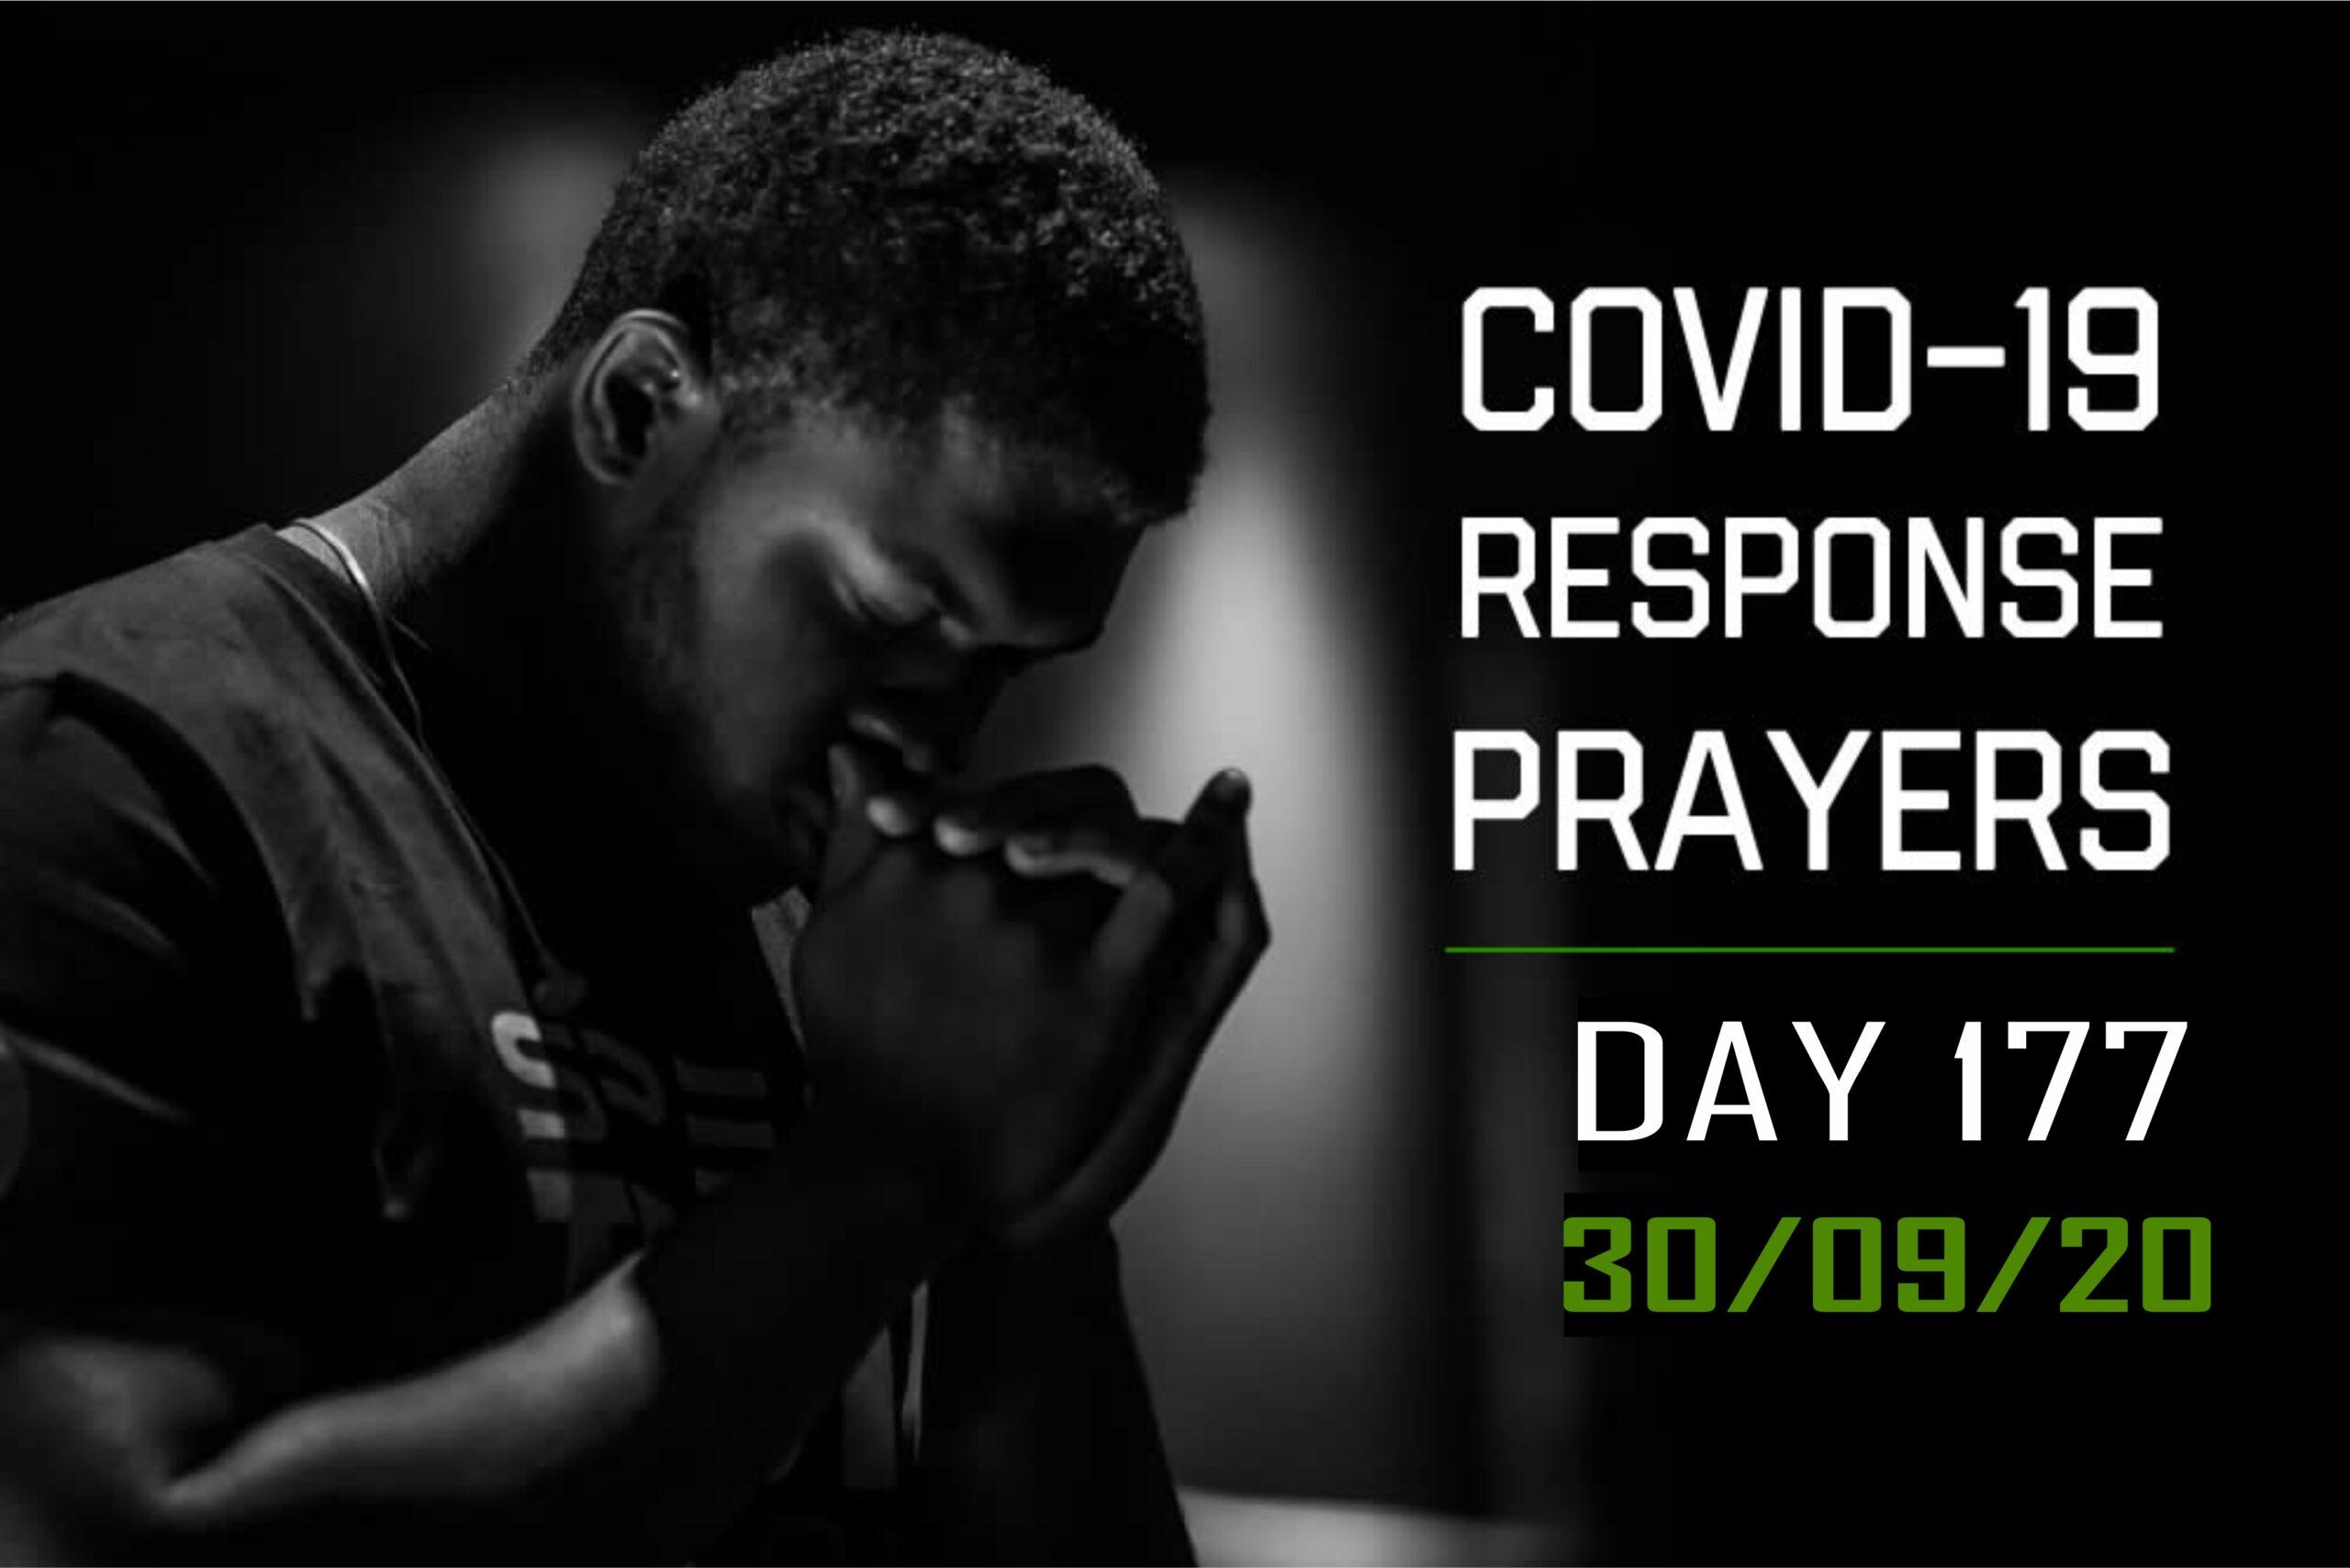 COVID-19 Response Prayers Day – 177